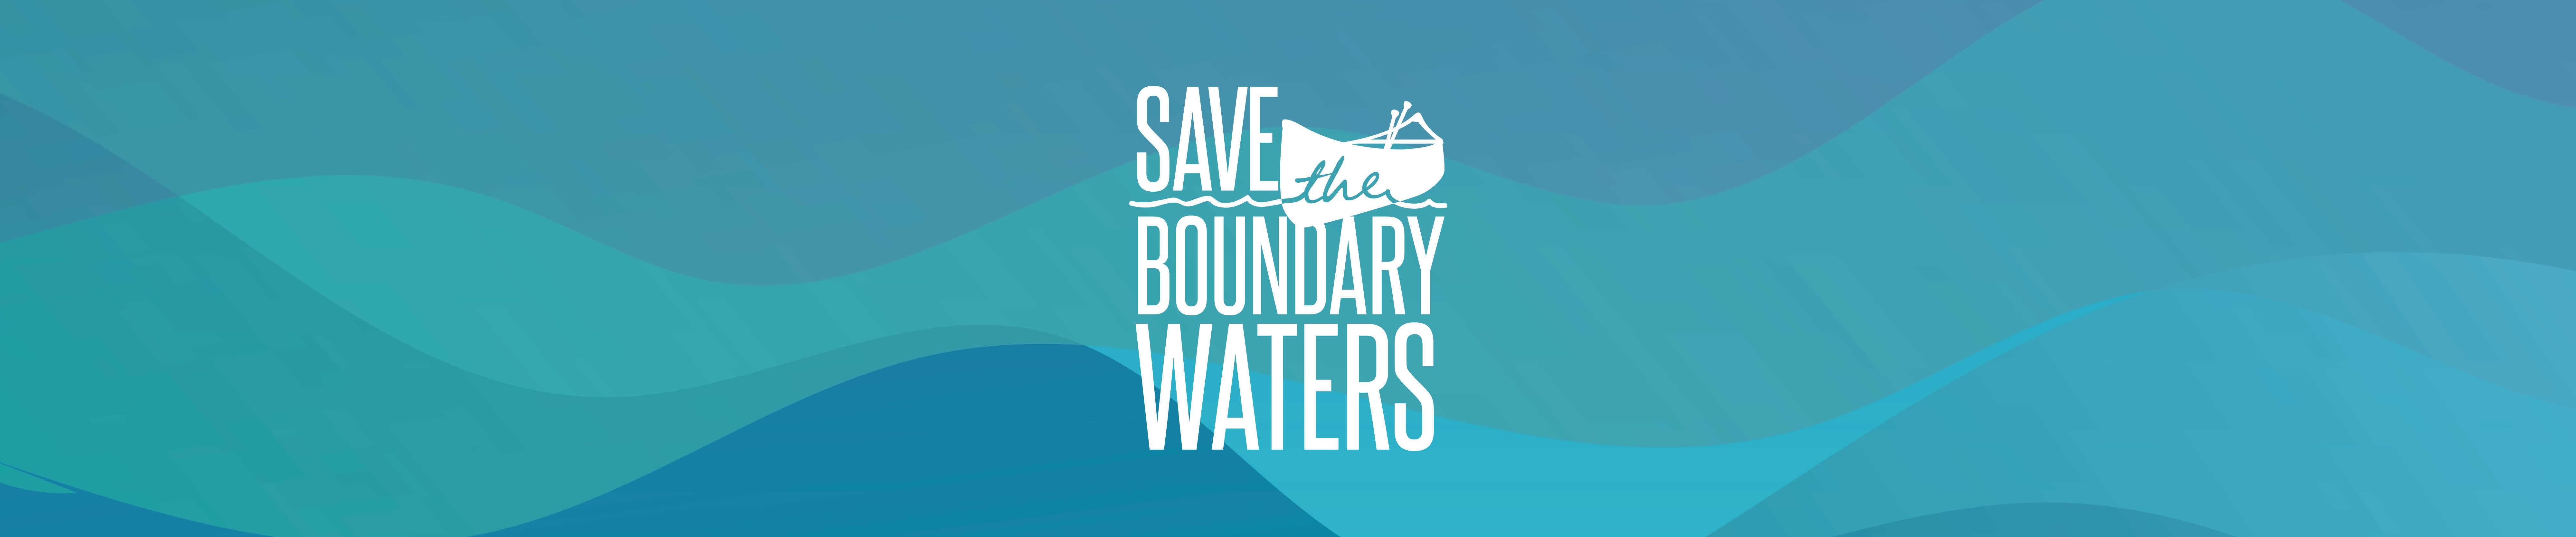 www.savetheboundarywaters.org